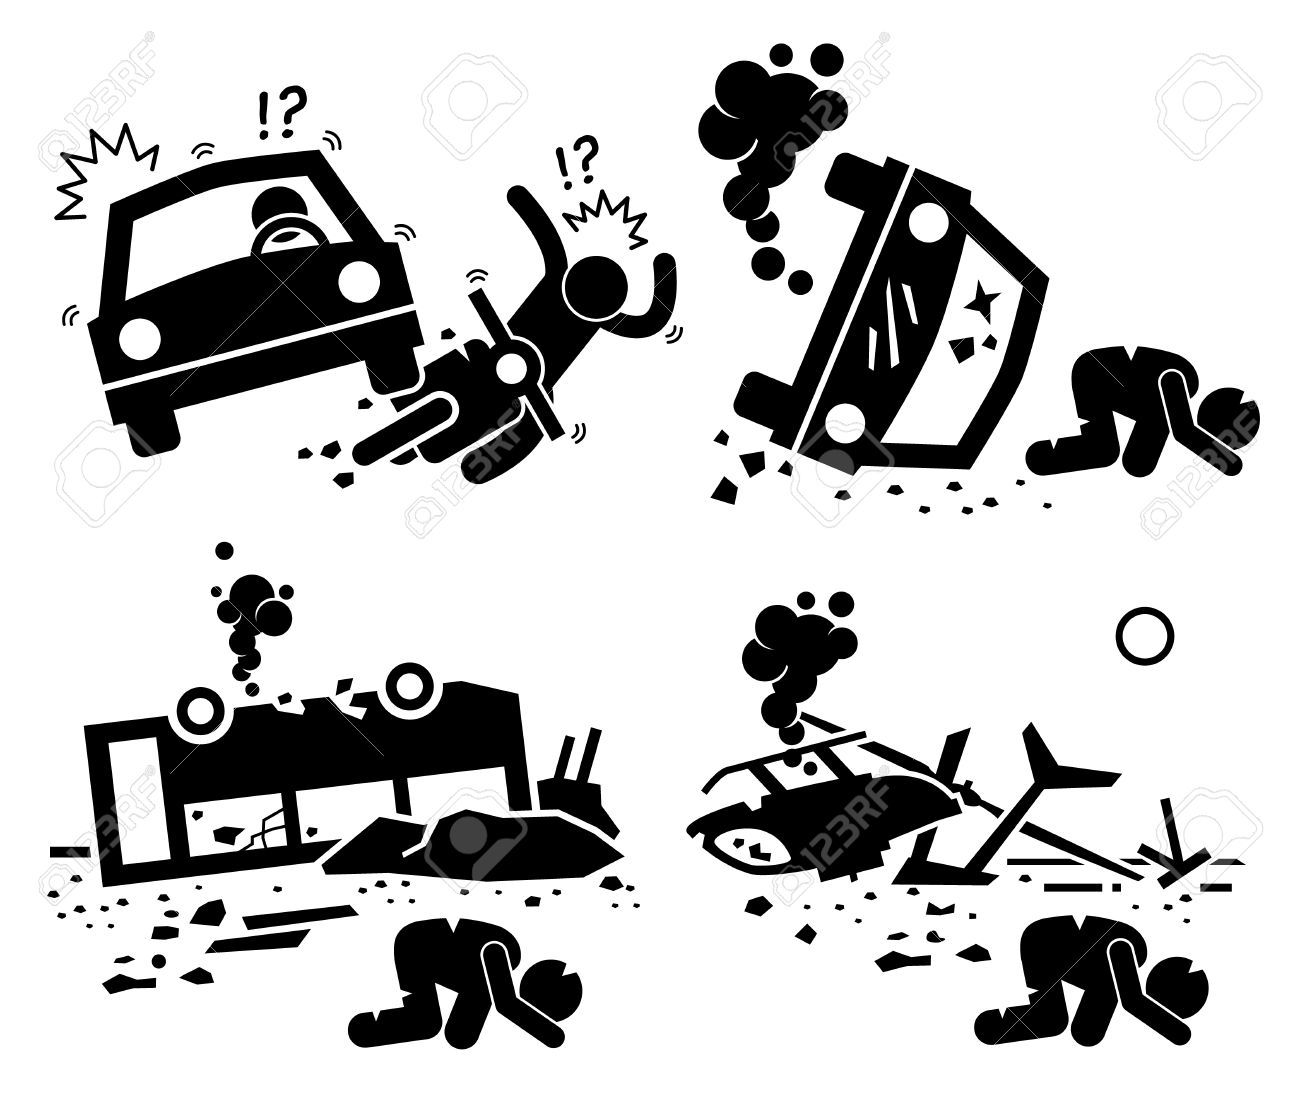 Bus car crash clipart graphic royalty free stock Stock Vector | ART in 2019 | Car drawings, Car illustration, Art ... graphic royalty free stock